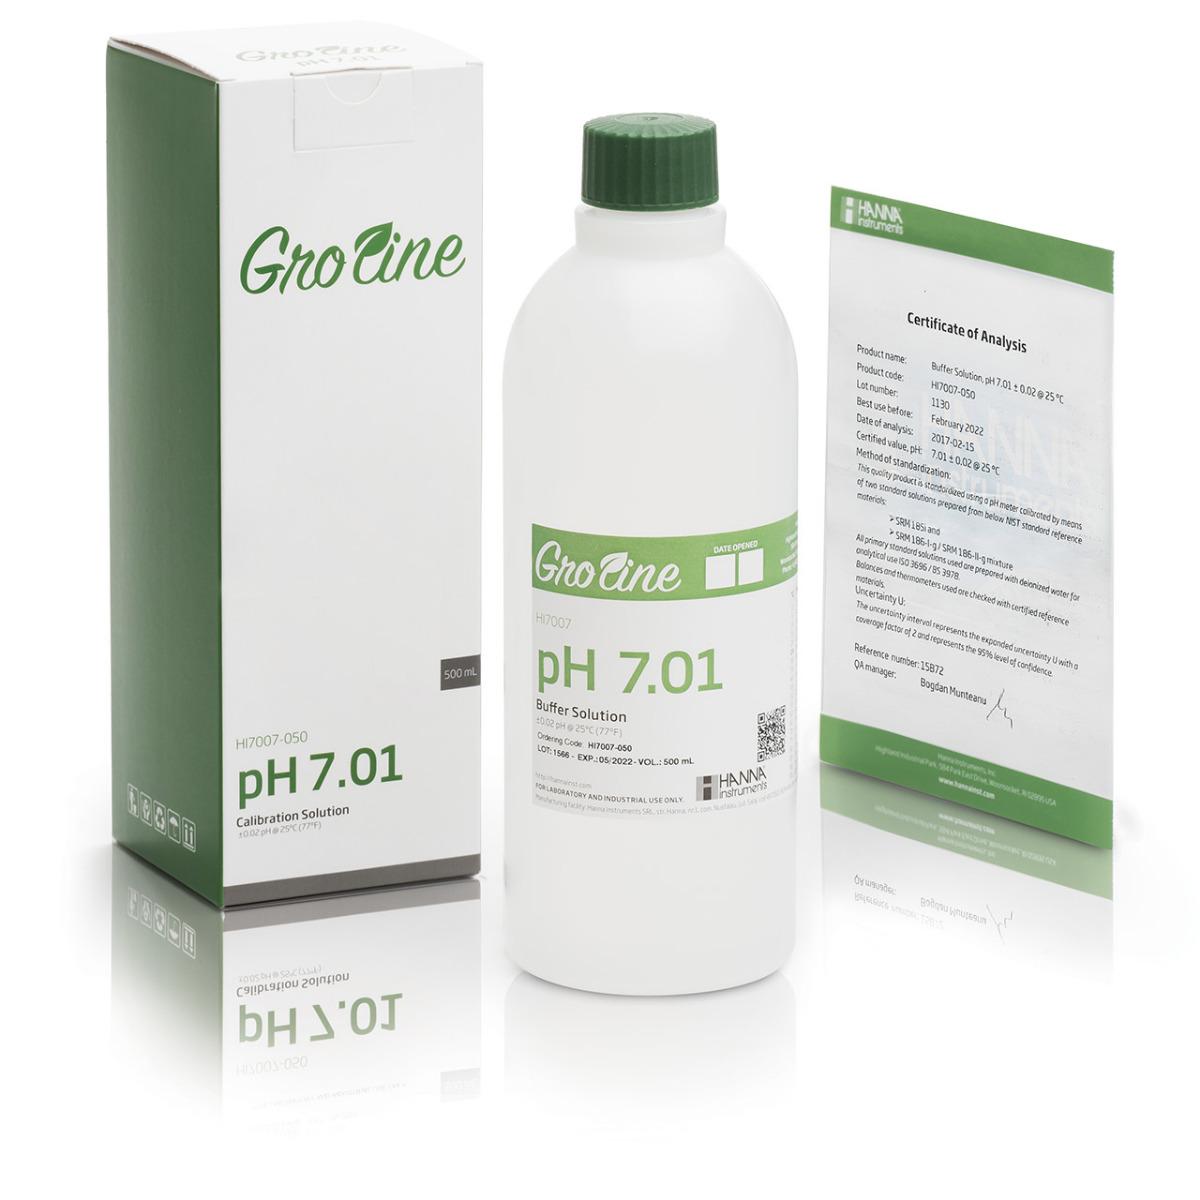 GroLine pH 7.01 Calibration Buffer (500 mL) - HI7007-050